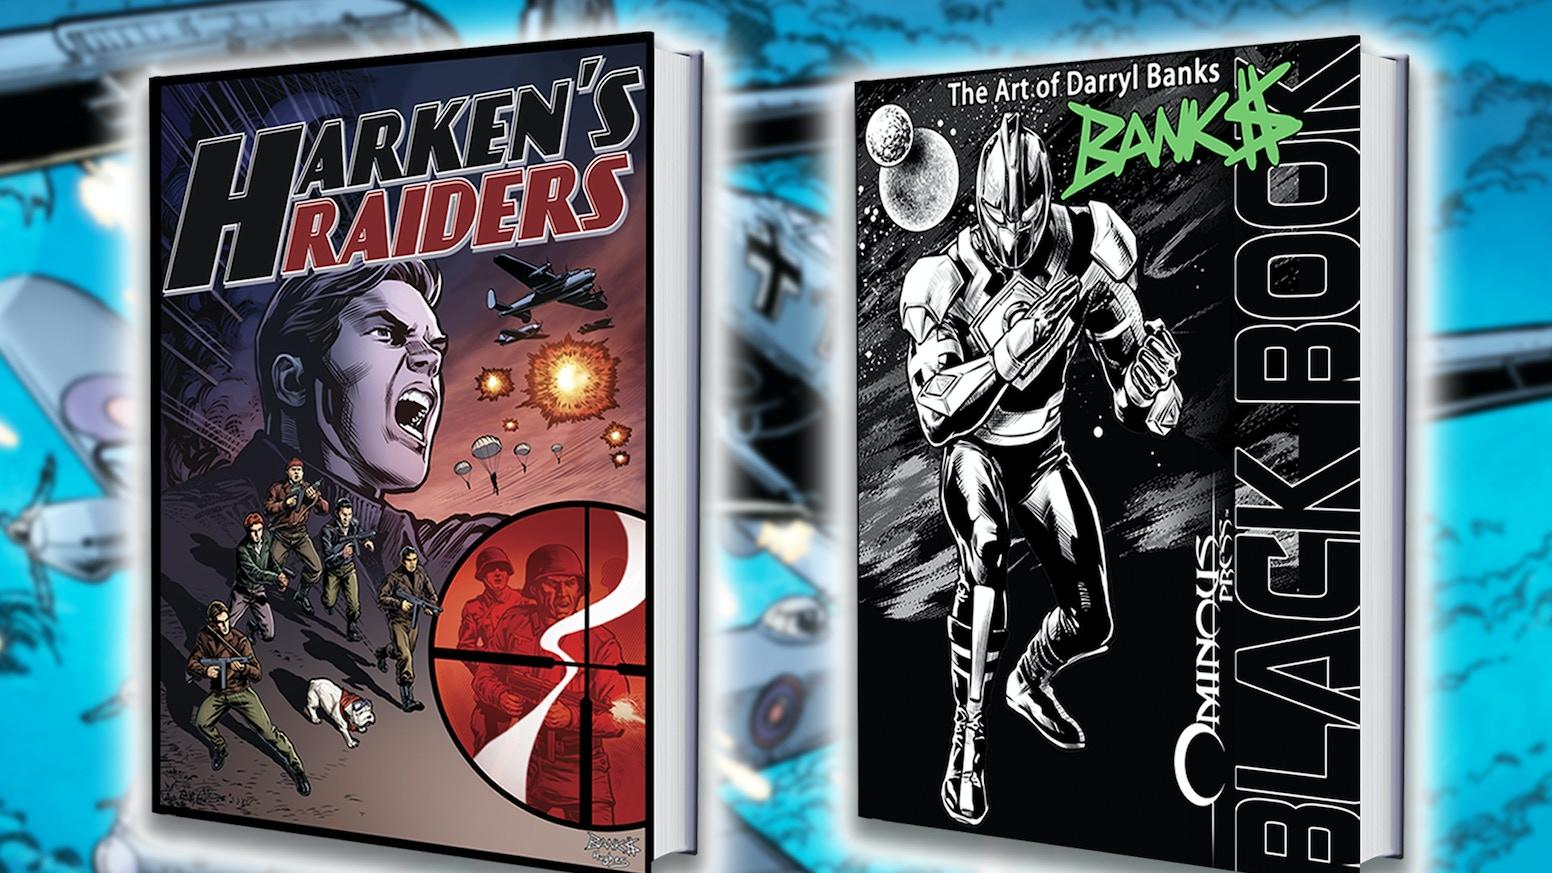 Ron Marz, Darryl Banks Team for WW2 Harken's Raiders Comic